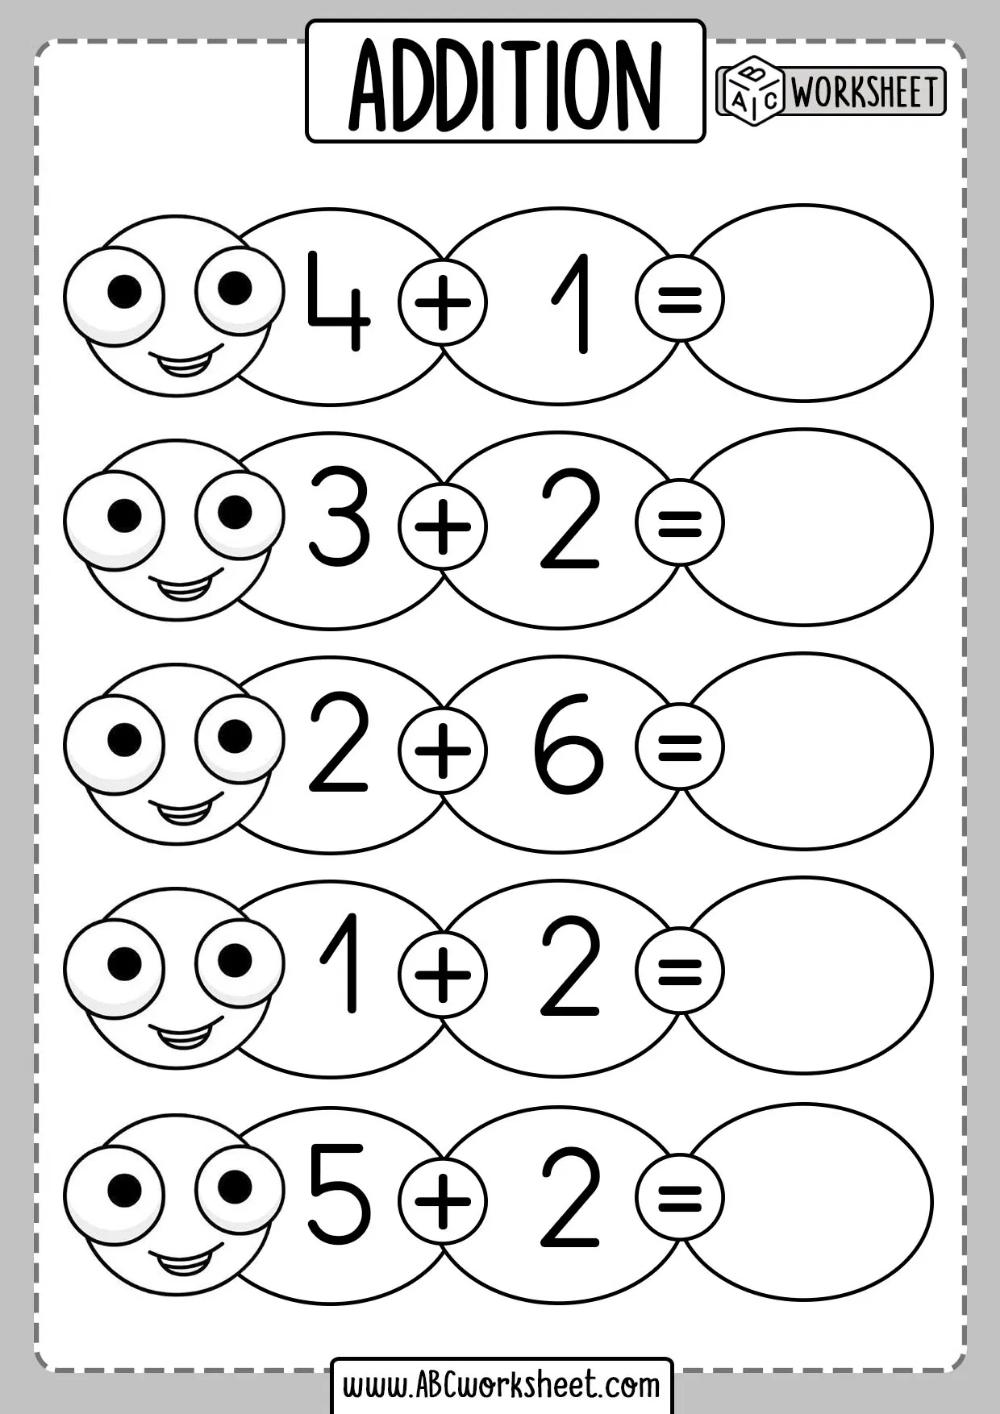 medium resolution of Beginner Addition Worksheets   Addition worksheets